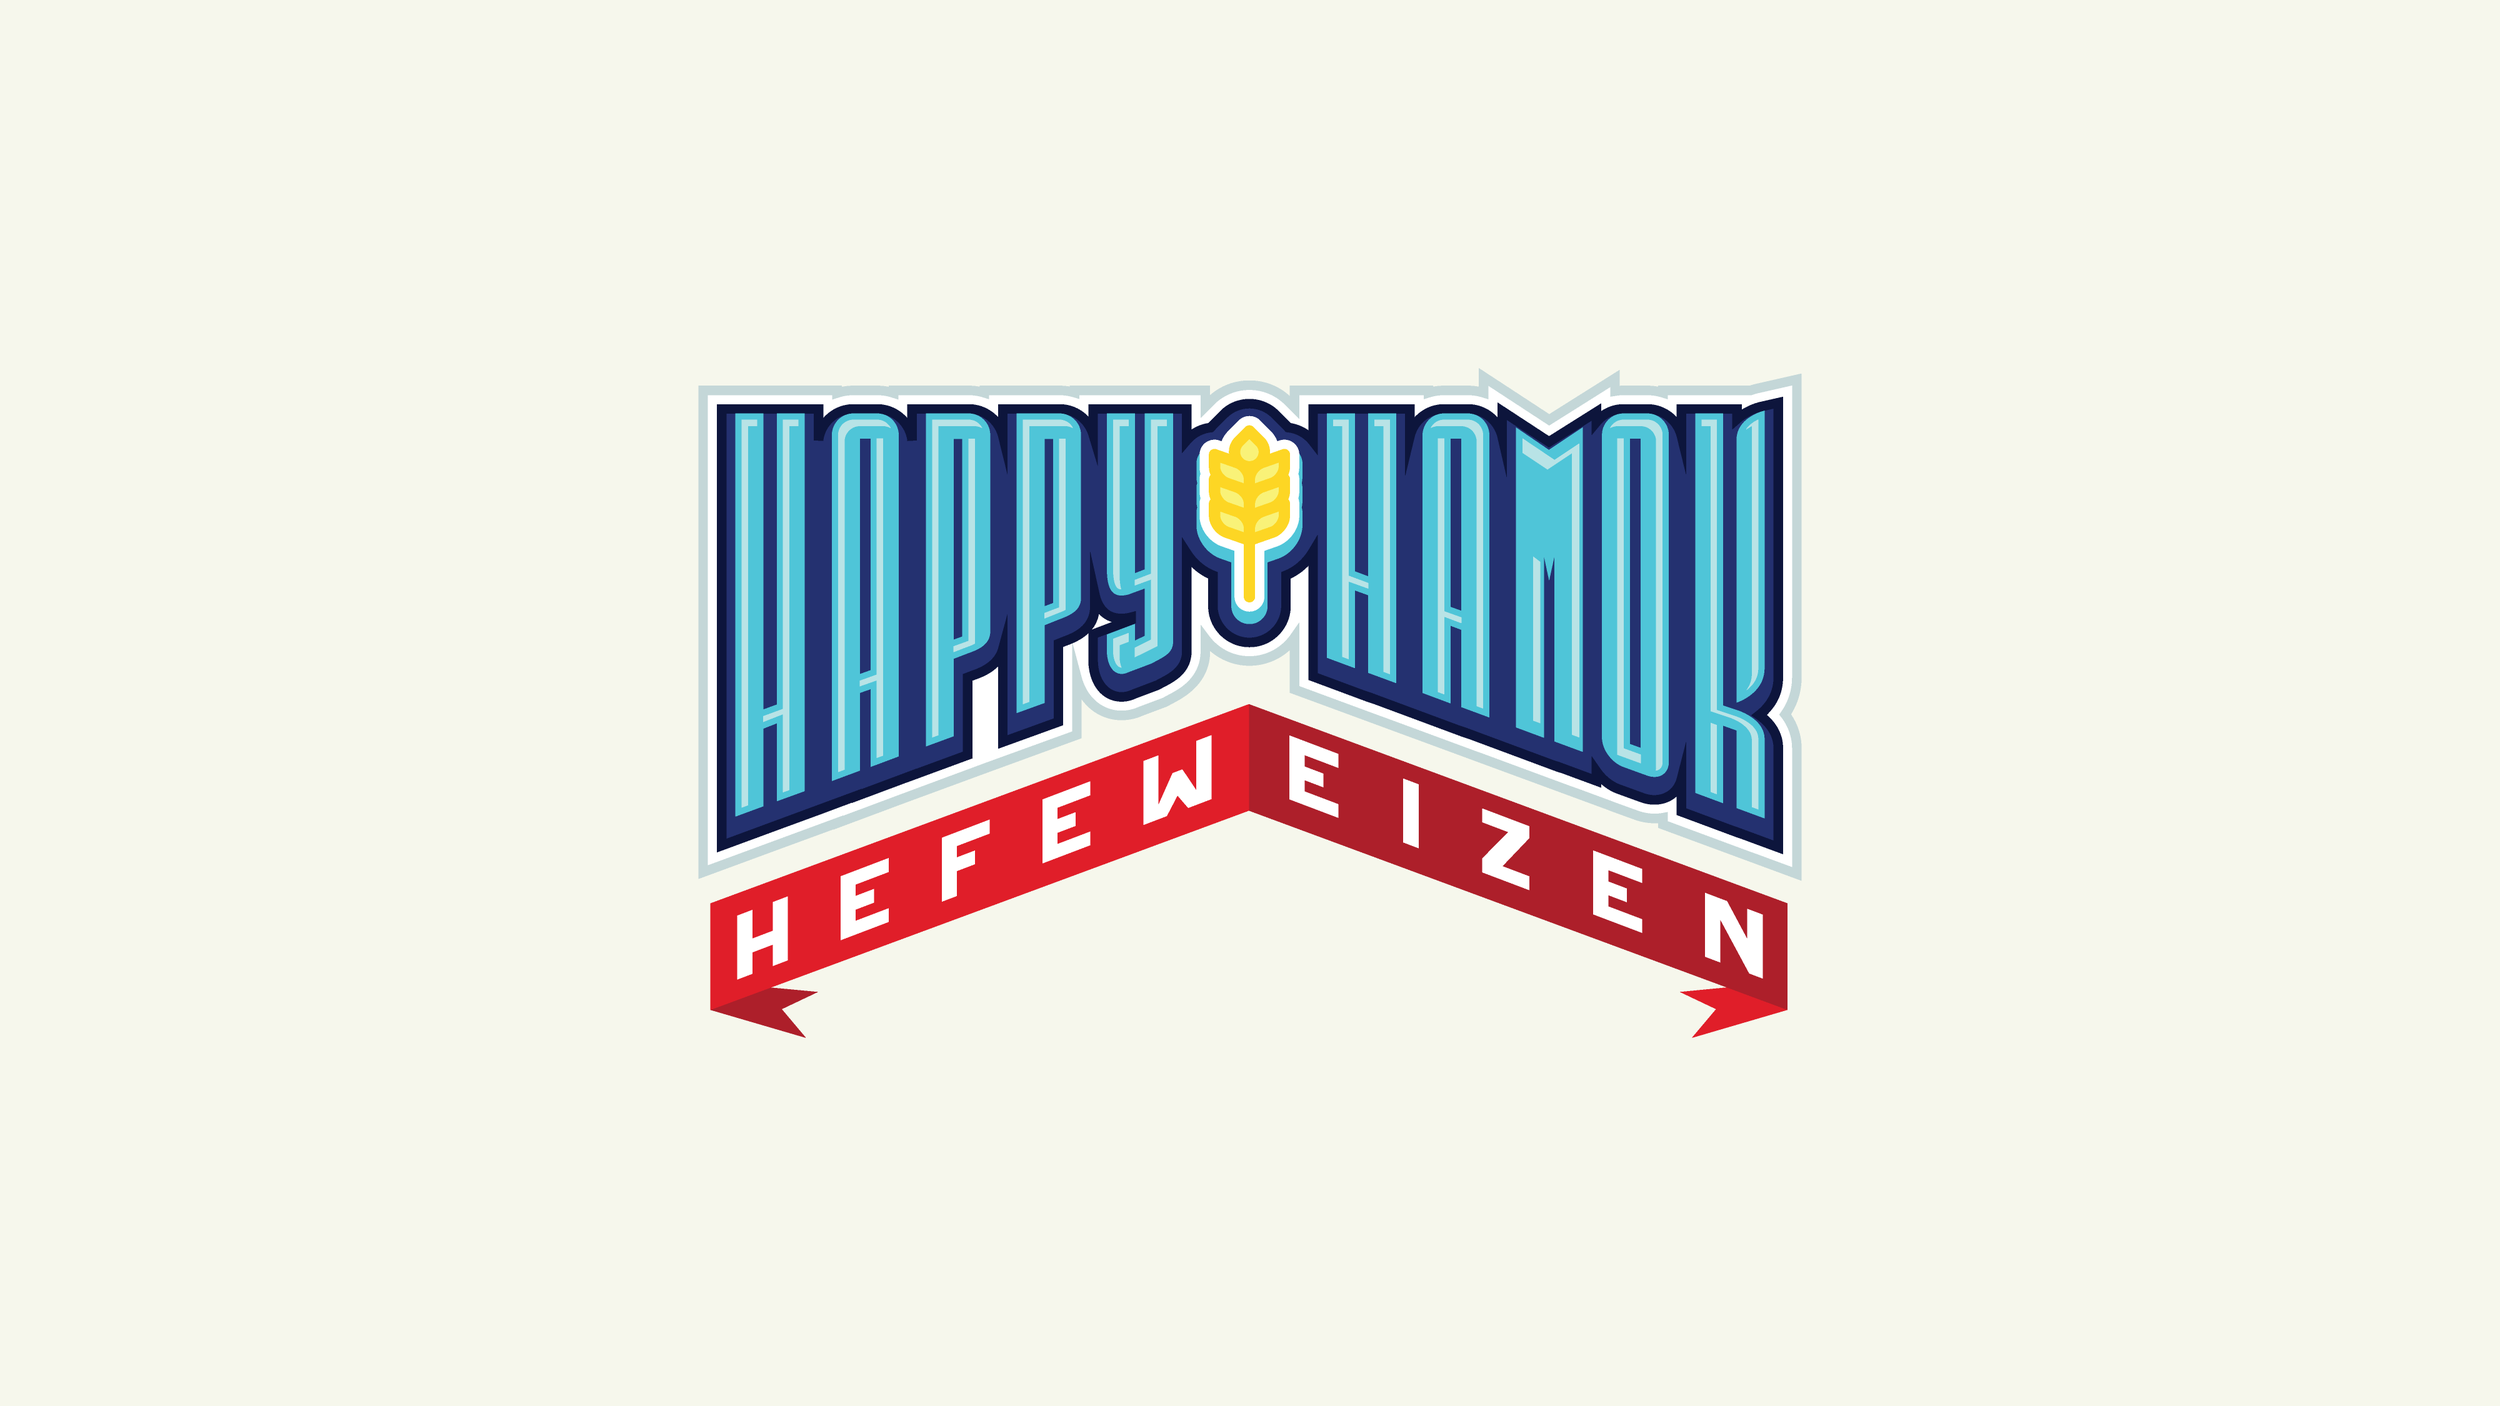 Happy Hamok